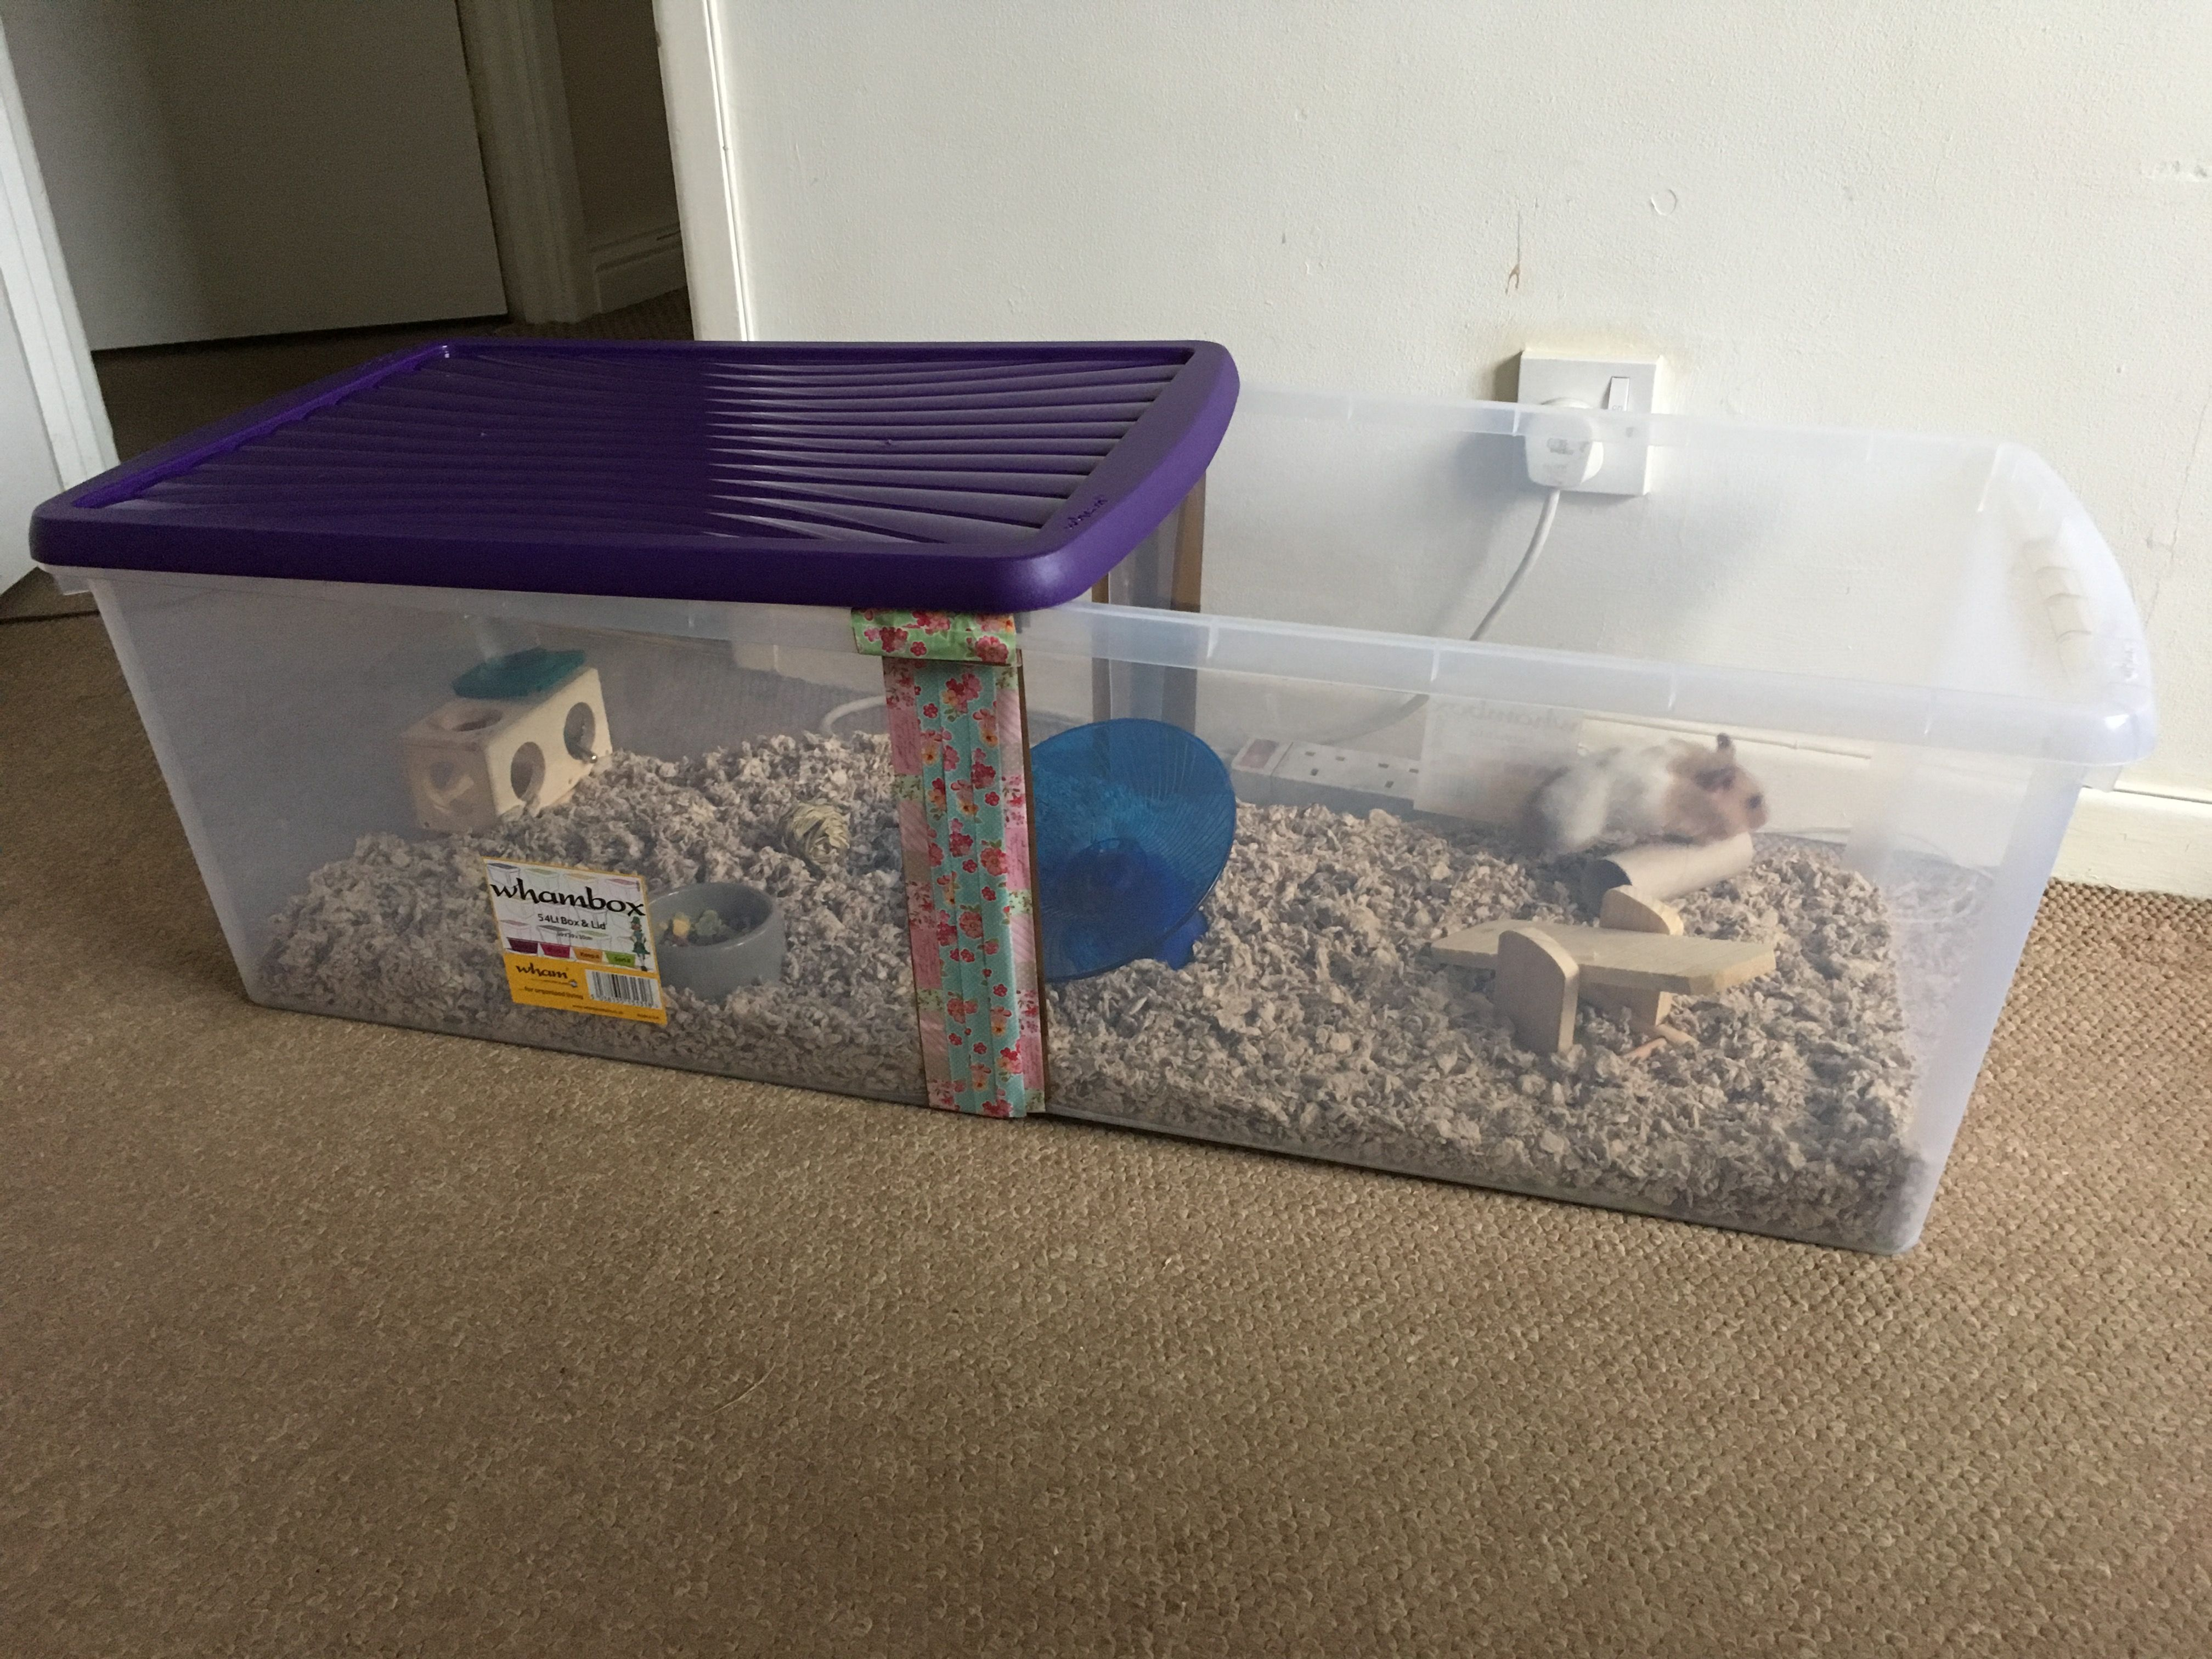 Hamster Bin Cage 54lt Box 59 X 39 X 30 Inches Hamster Bin